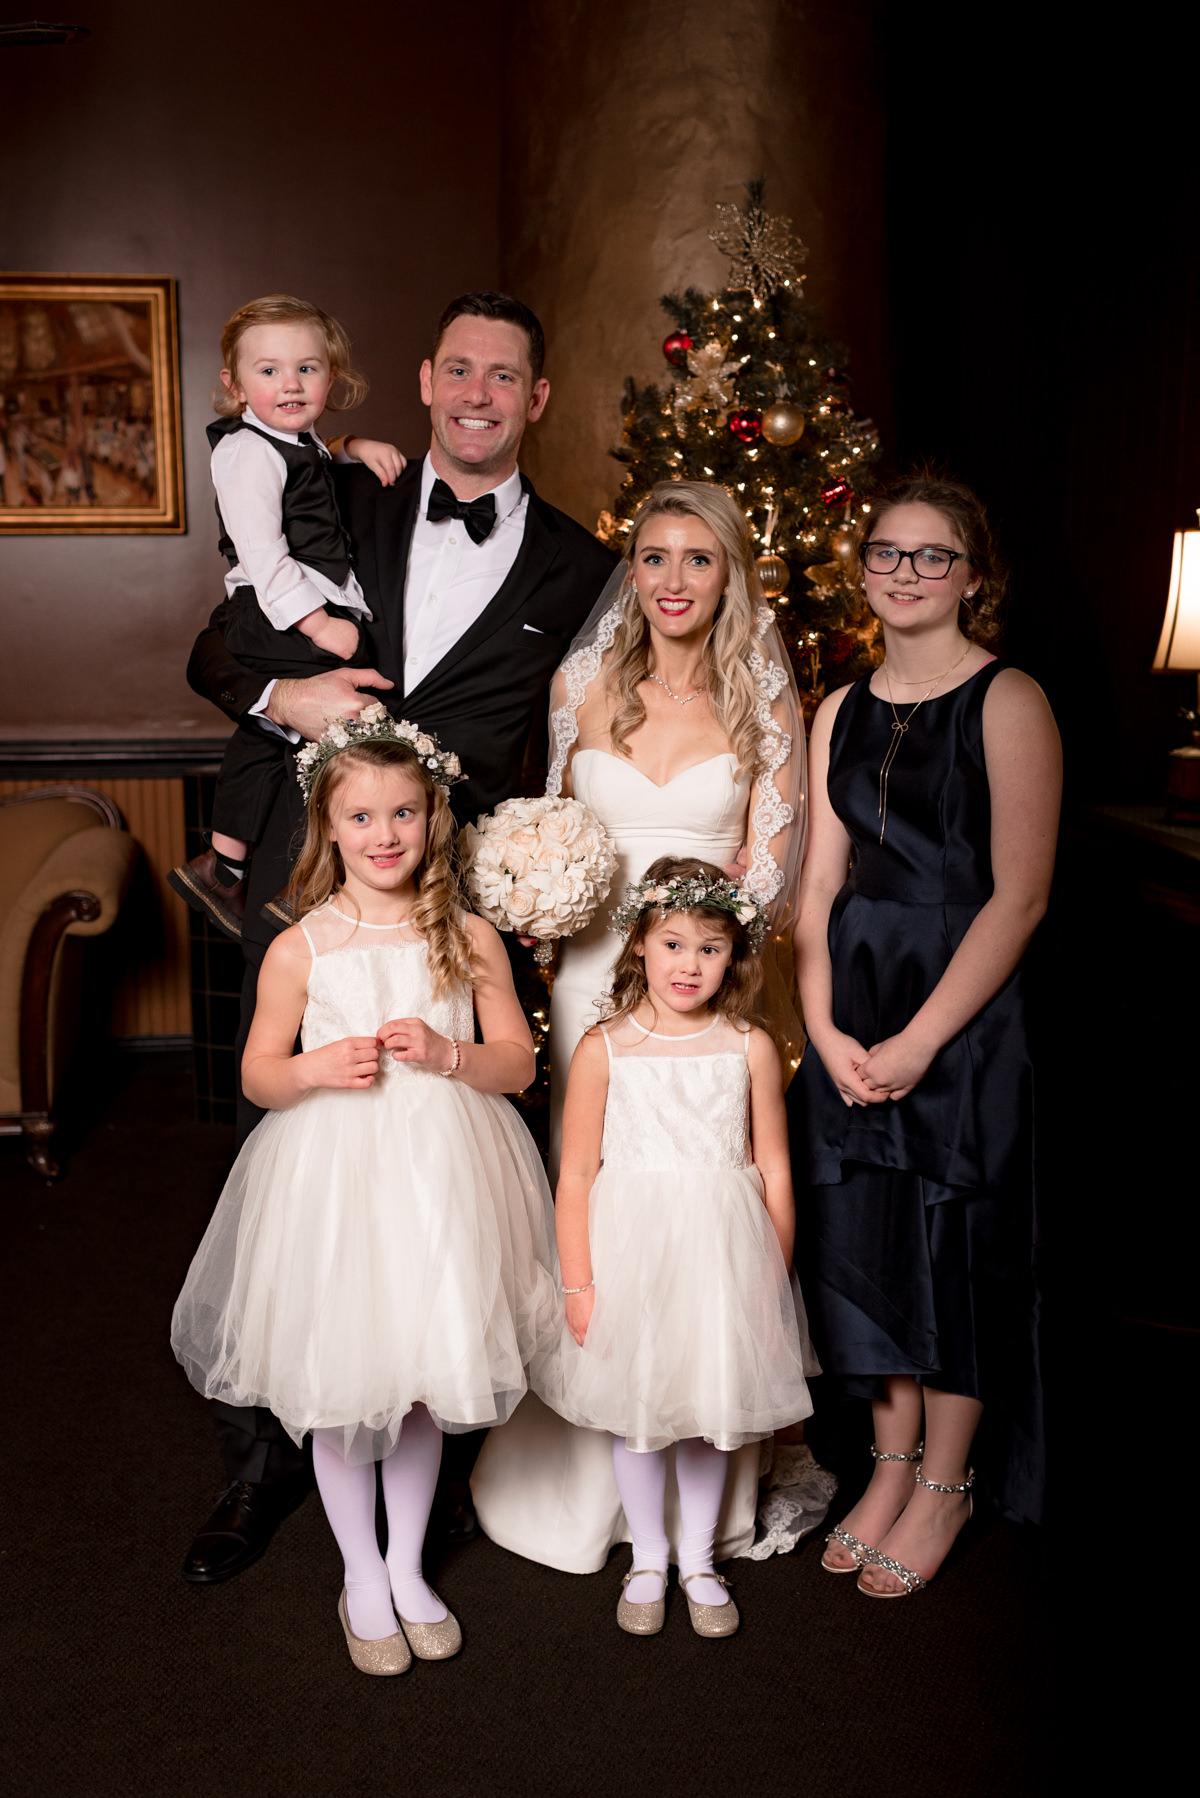 Andrew Tat - Documentary Wedding Photography - Lake Union Cafe - Seattle, Washington -Rachel and Ryan - 29.jpg